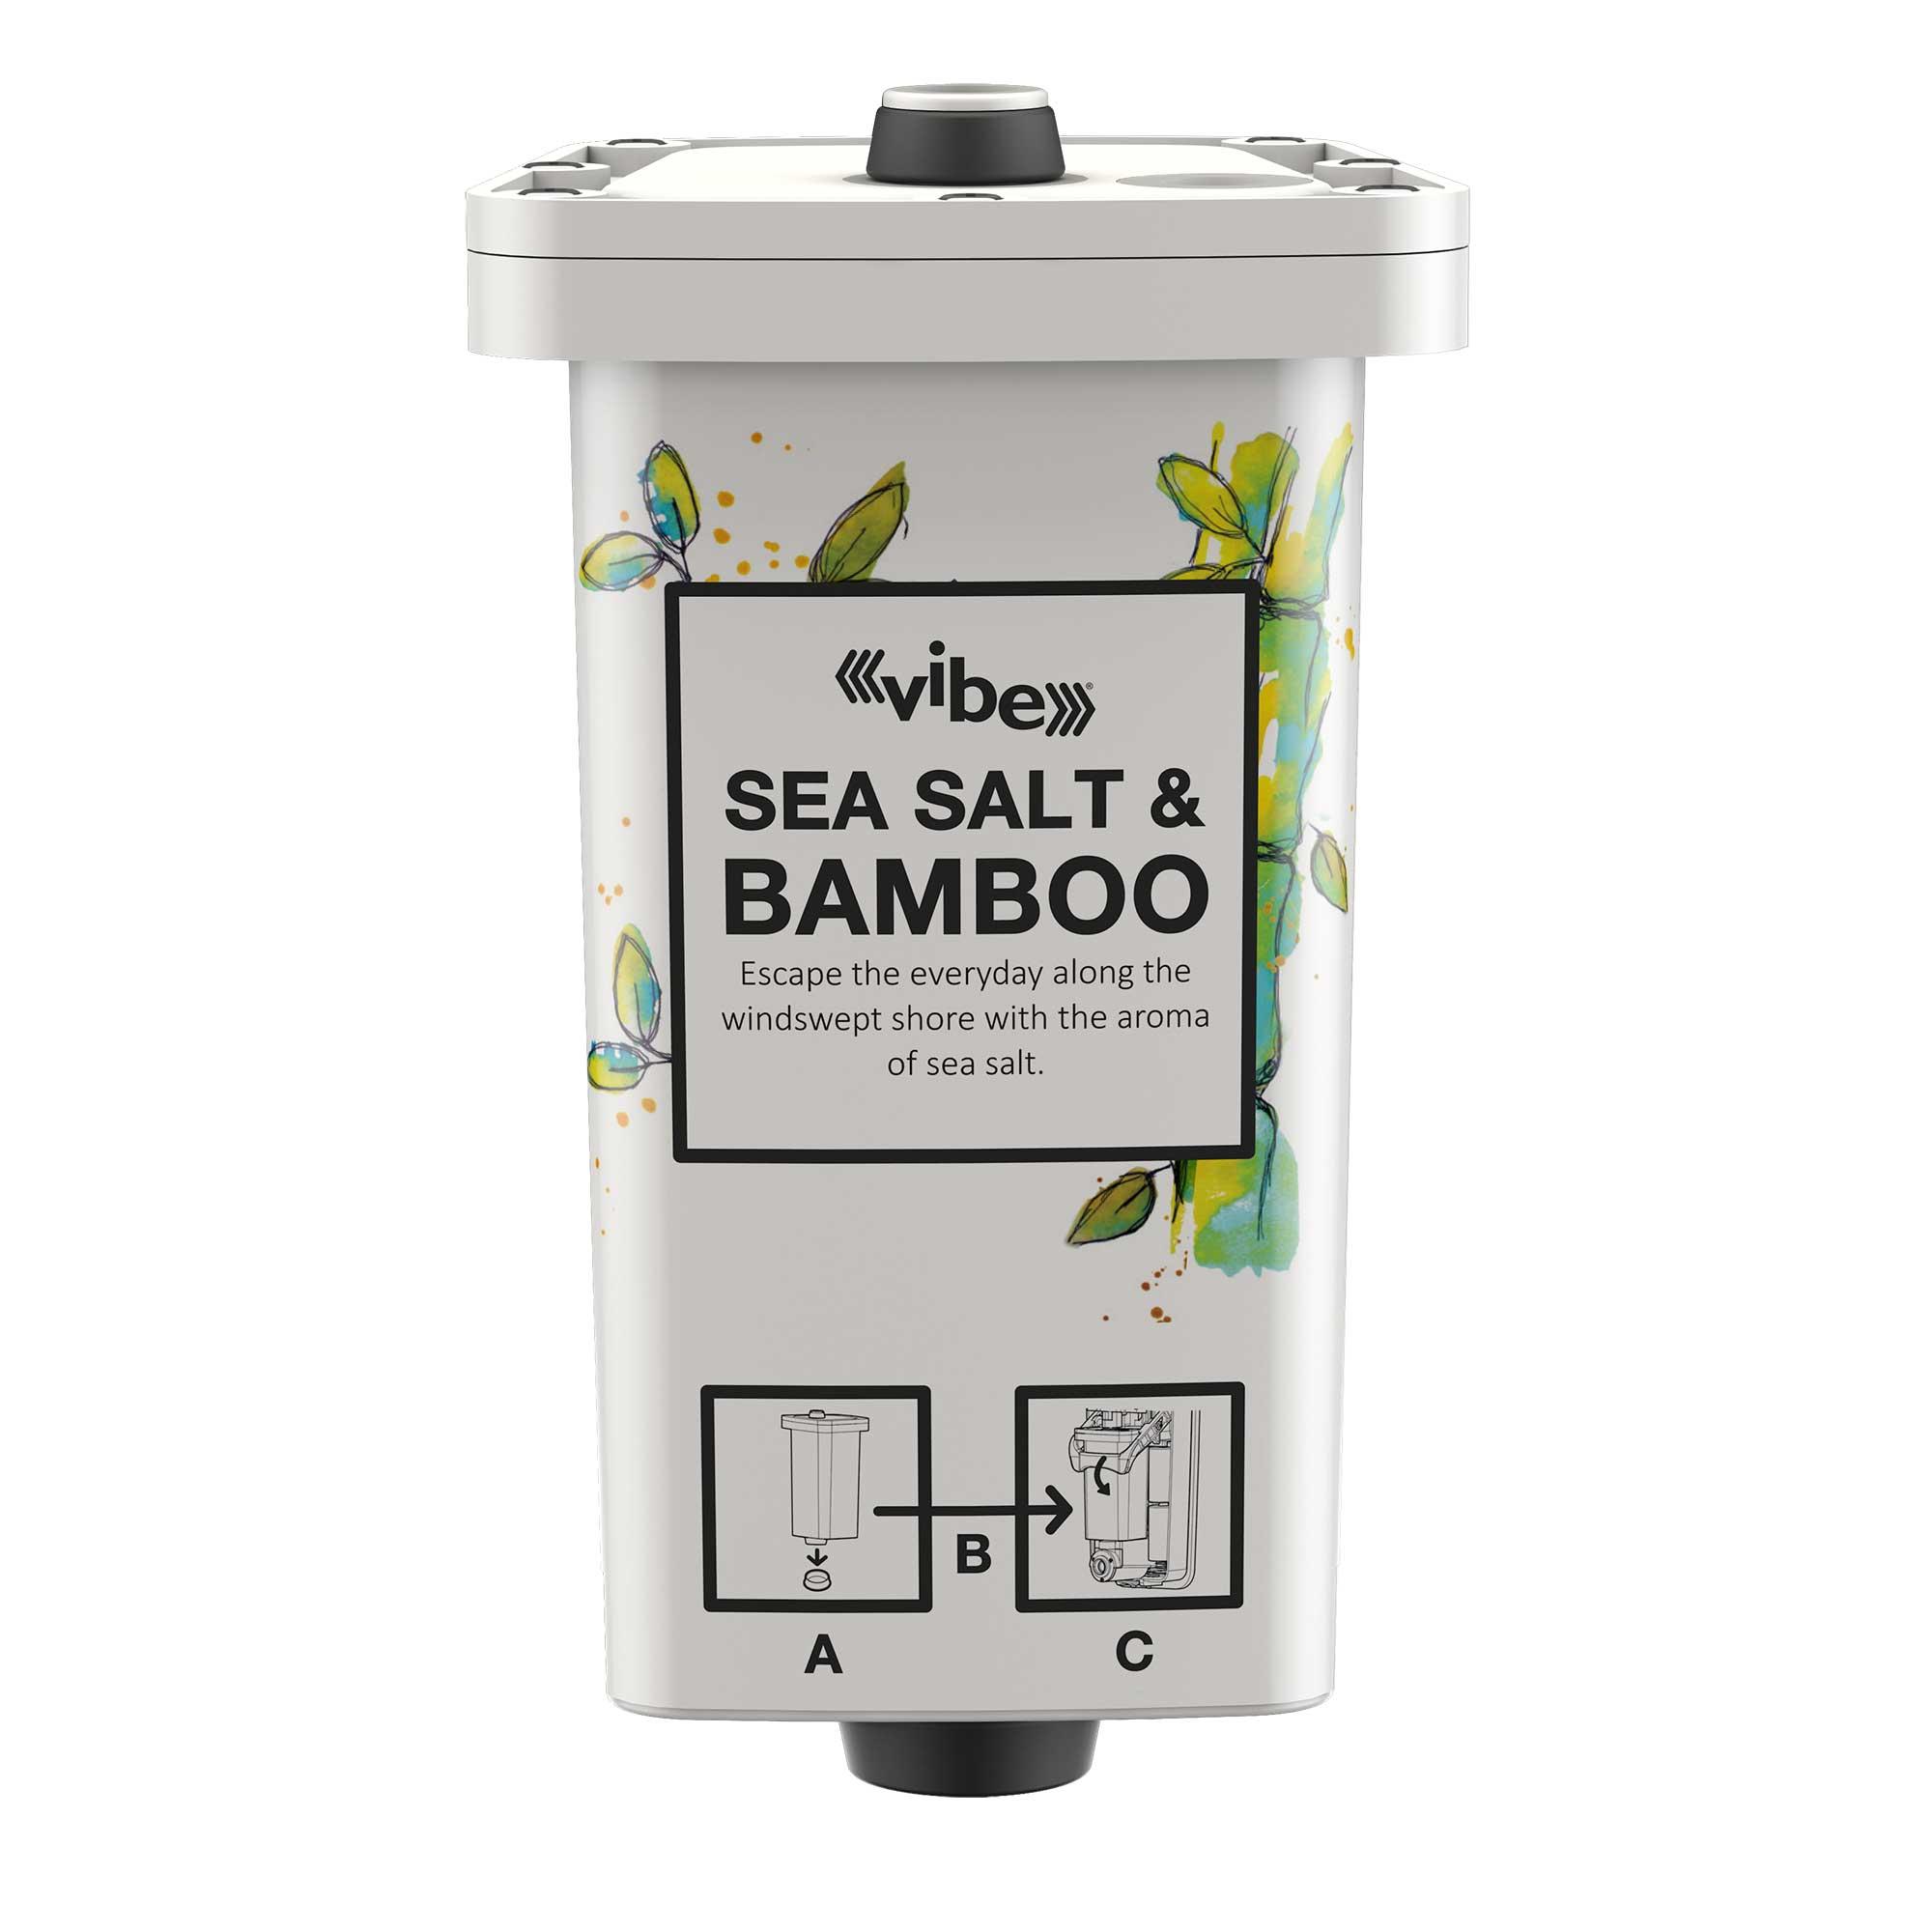 Vibe Sea Salt & Bamboo